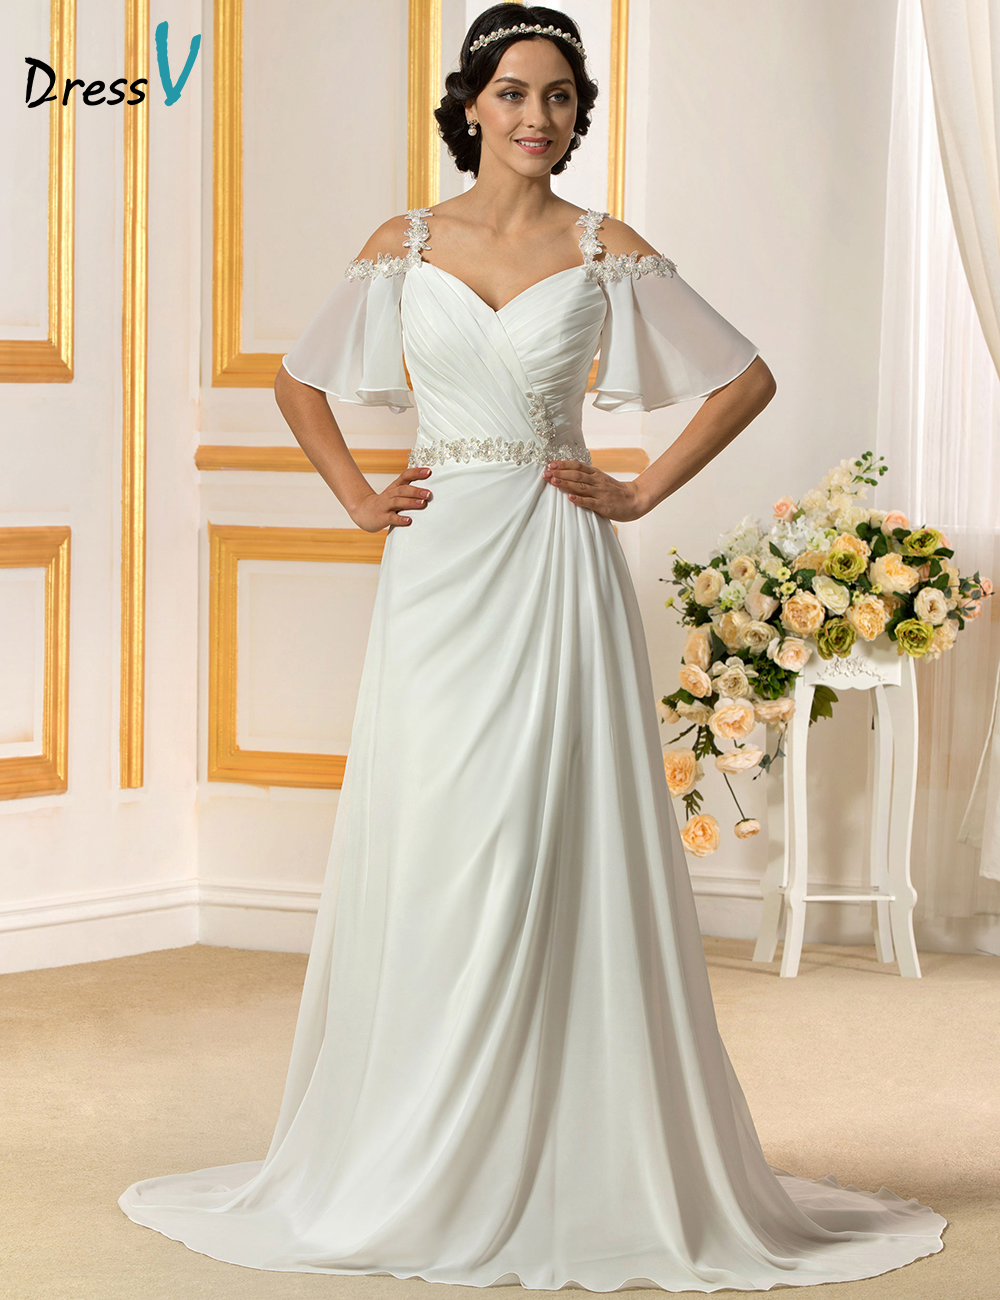 Buy romantic wedding dress 2016 white for Backless wedding dresses for sale